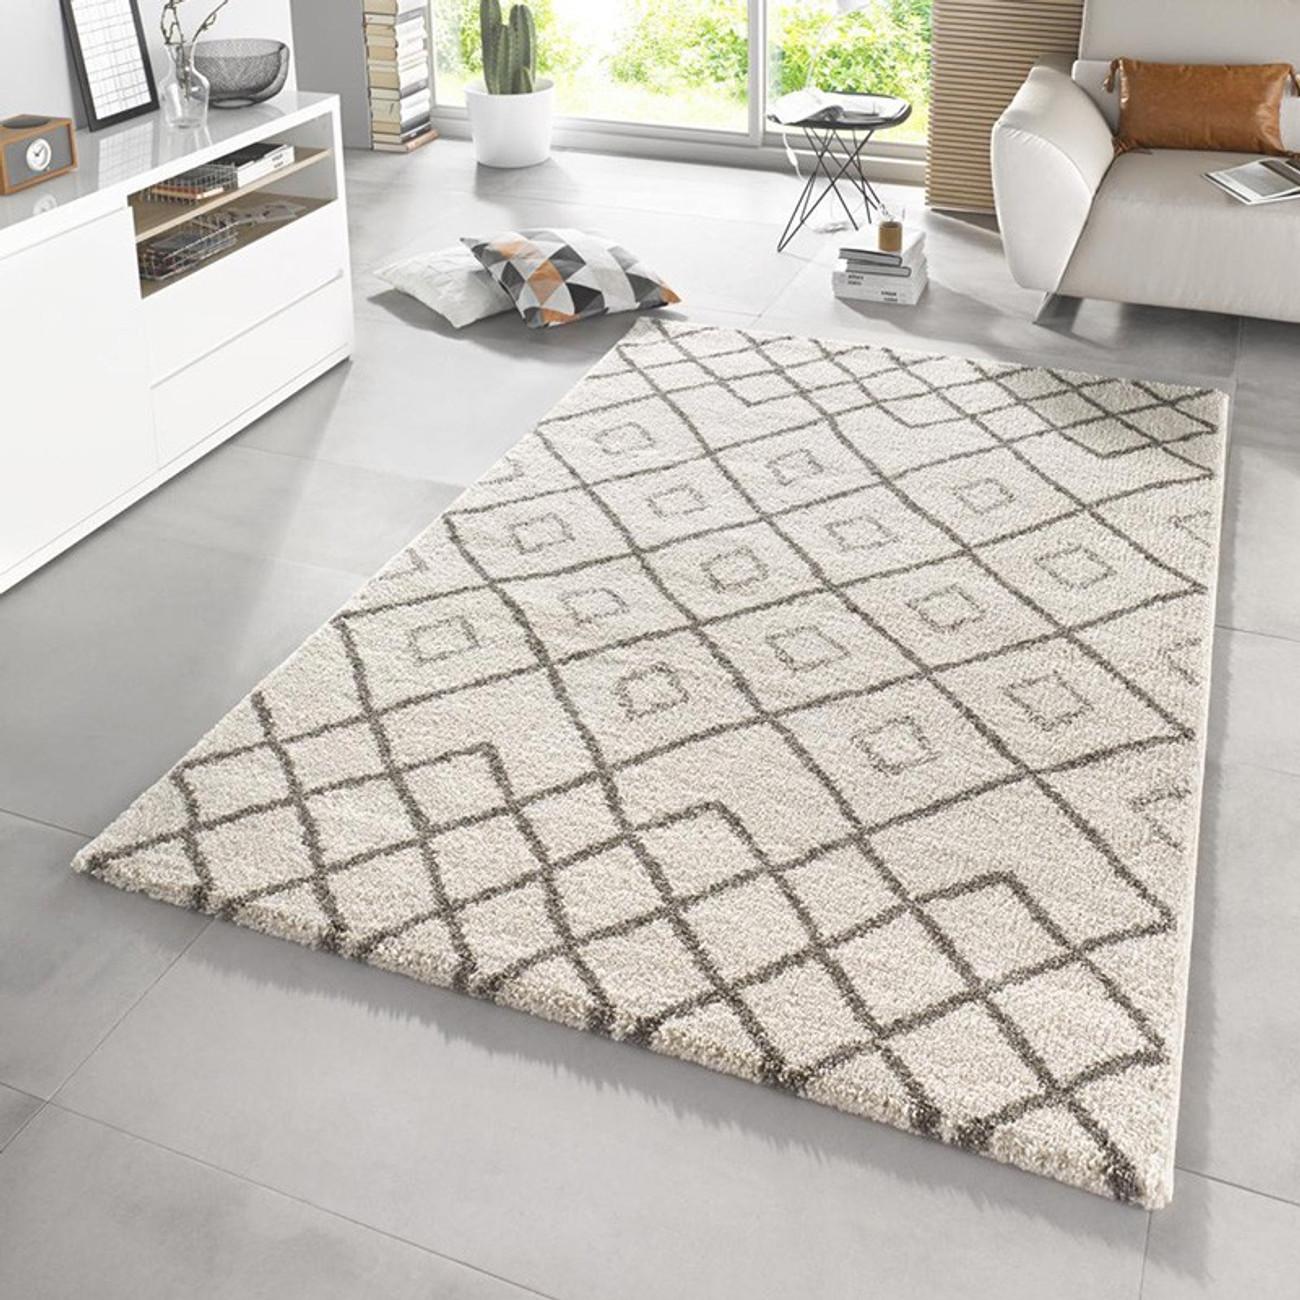 Design Hochflor Teppich Maison Creme Taupe | beganta.de - Onlineshop ...